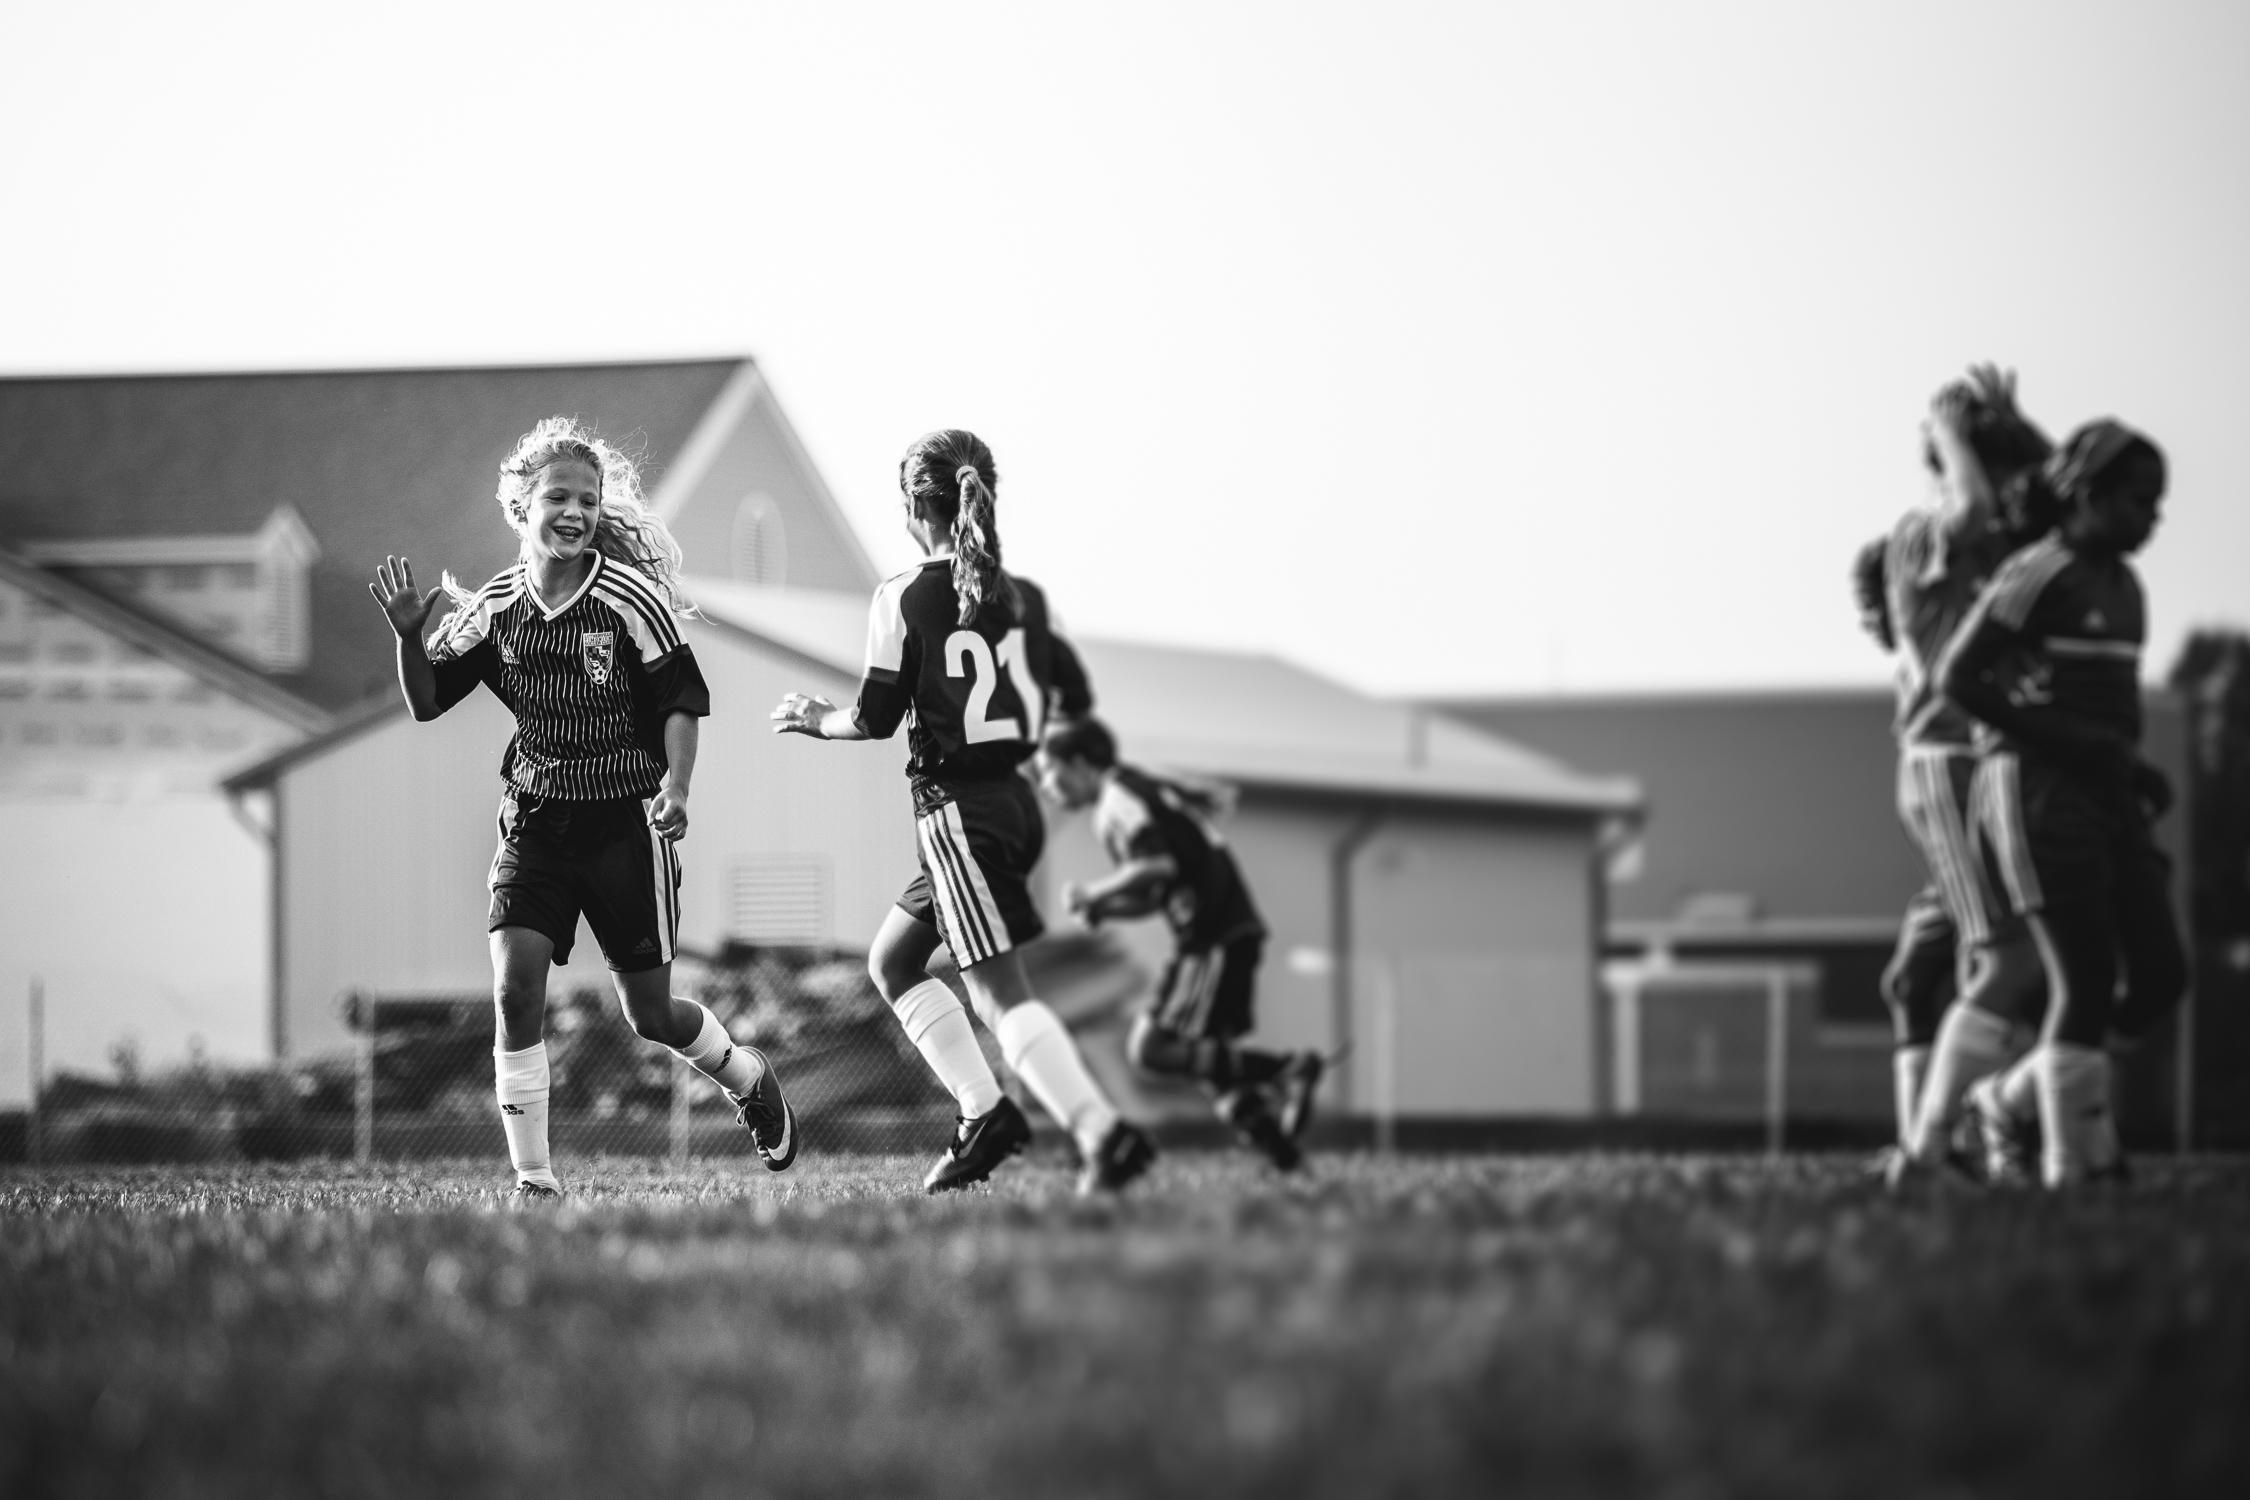 rebecca_wyatt_soccer_tie-1.jpg